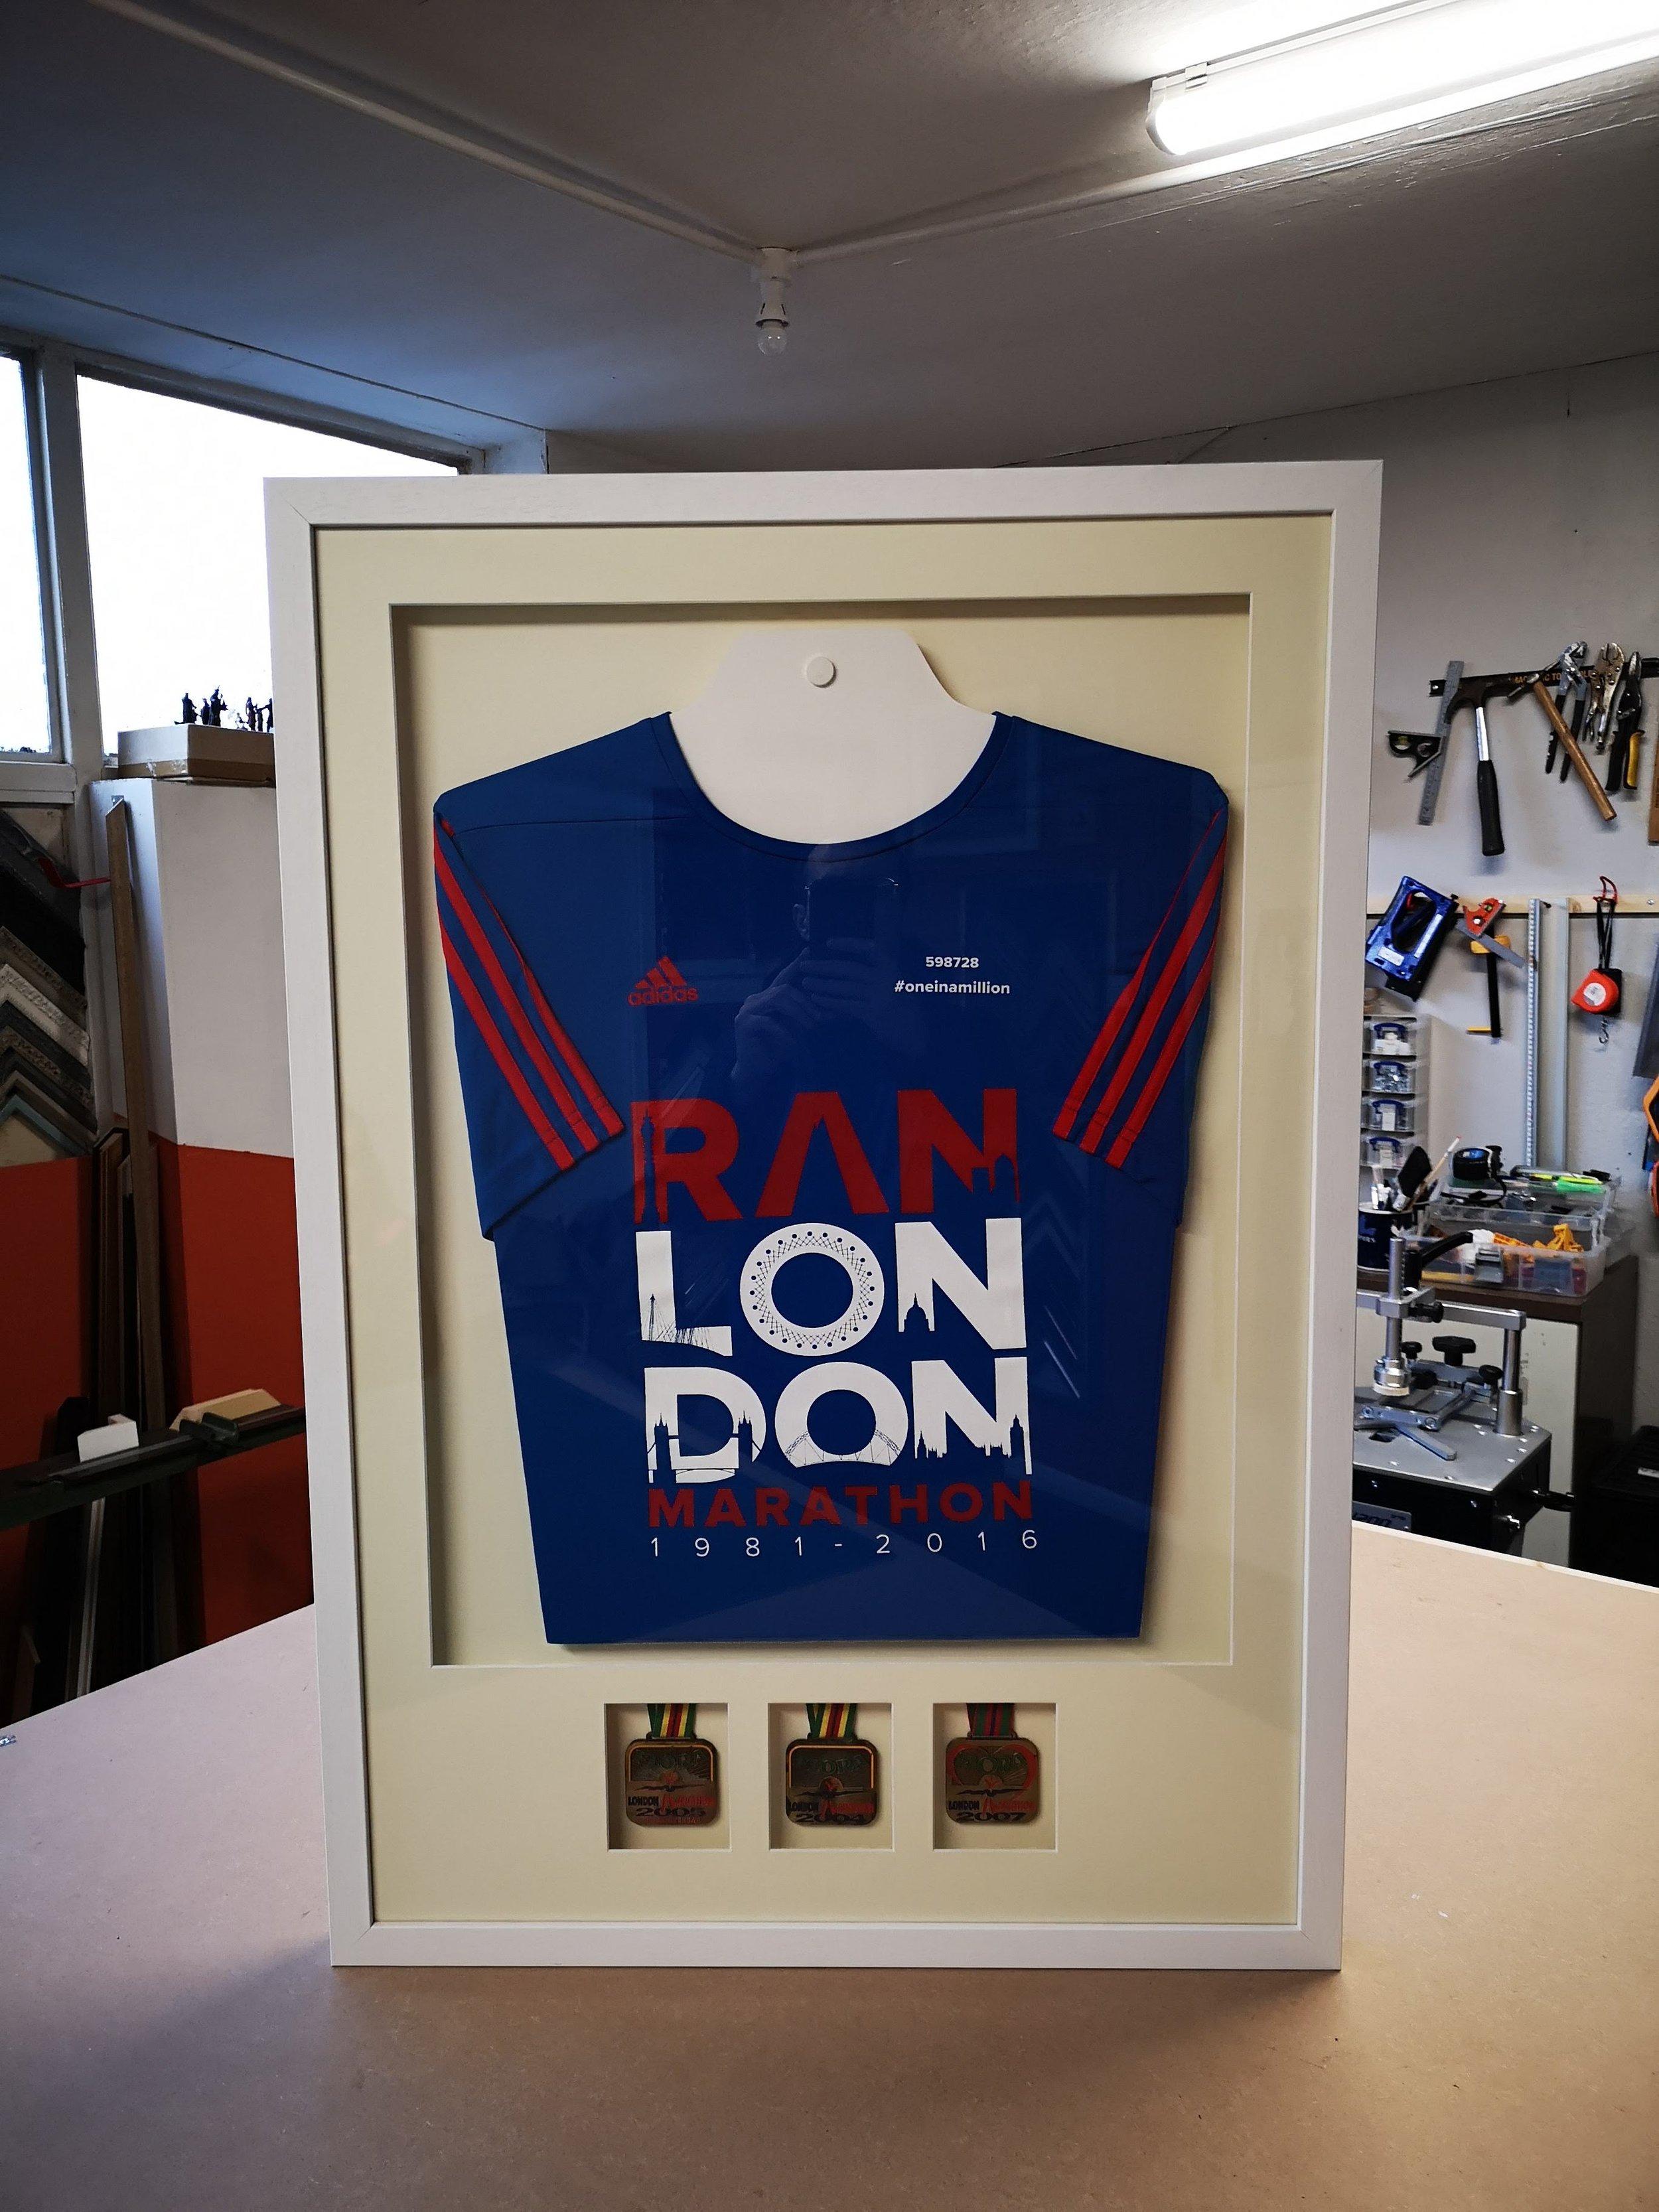 london marathon shirt and medals